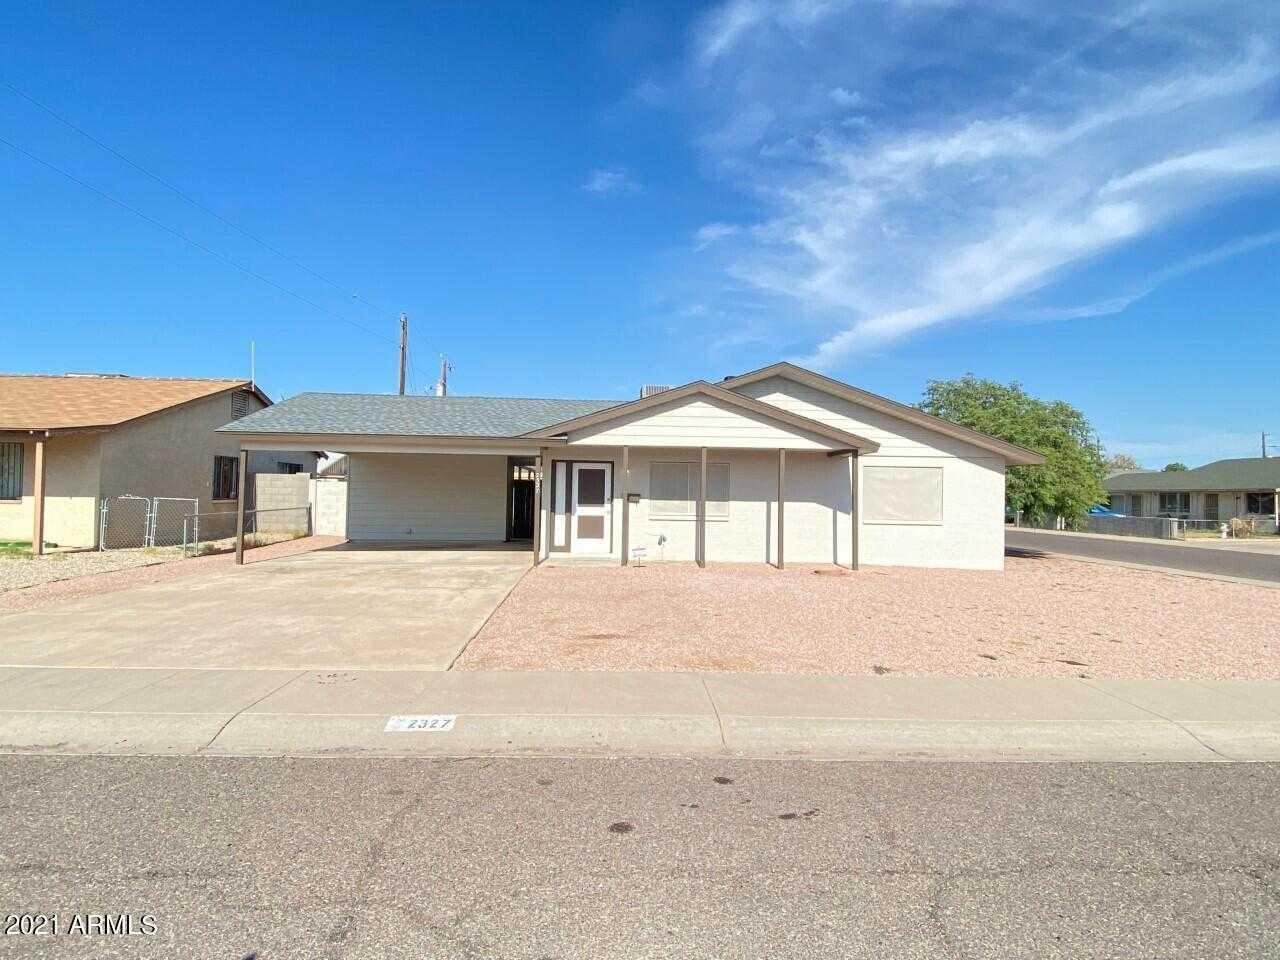 $354,900 - 4Br/2Ba - Home for Sale in Homestead Terrace Unit 6, Phoenix